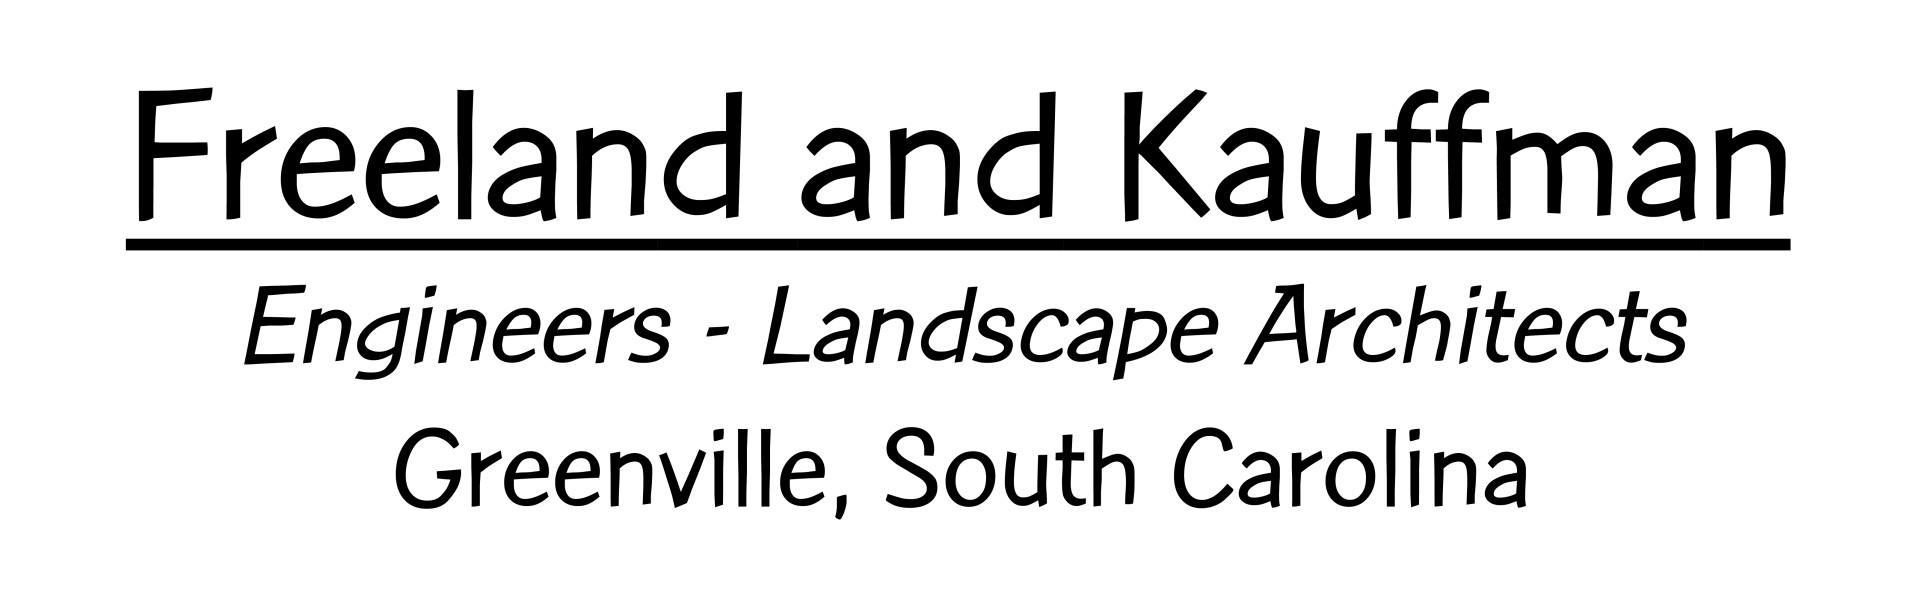 Freeland and Kauffman